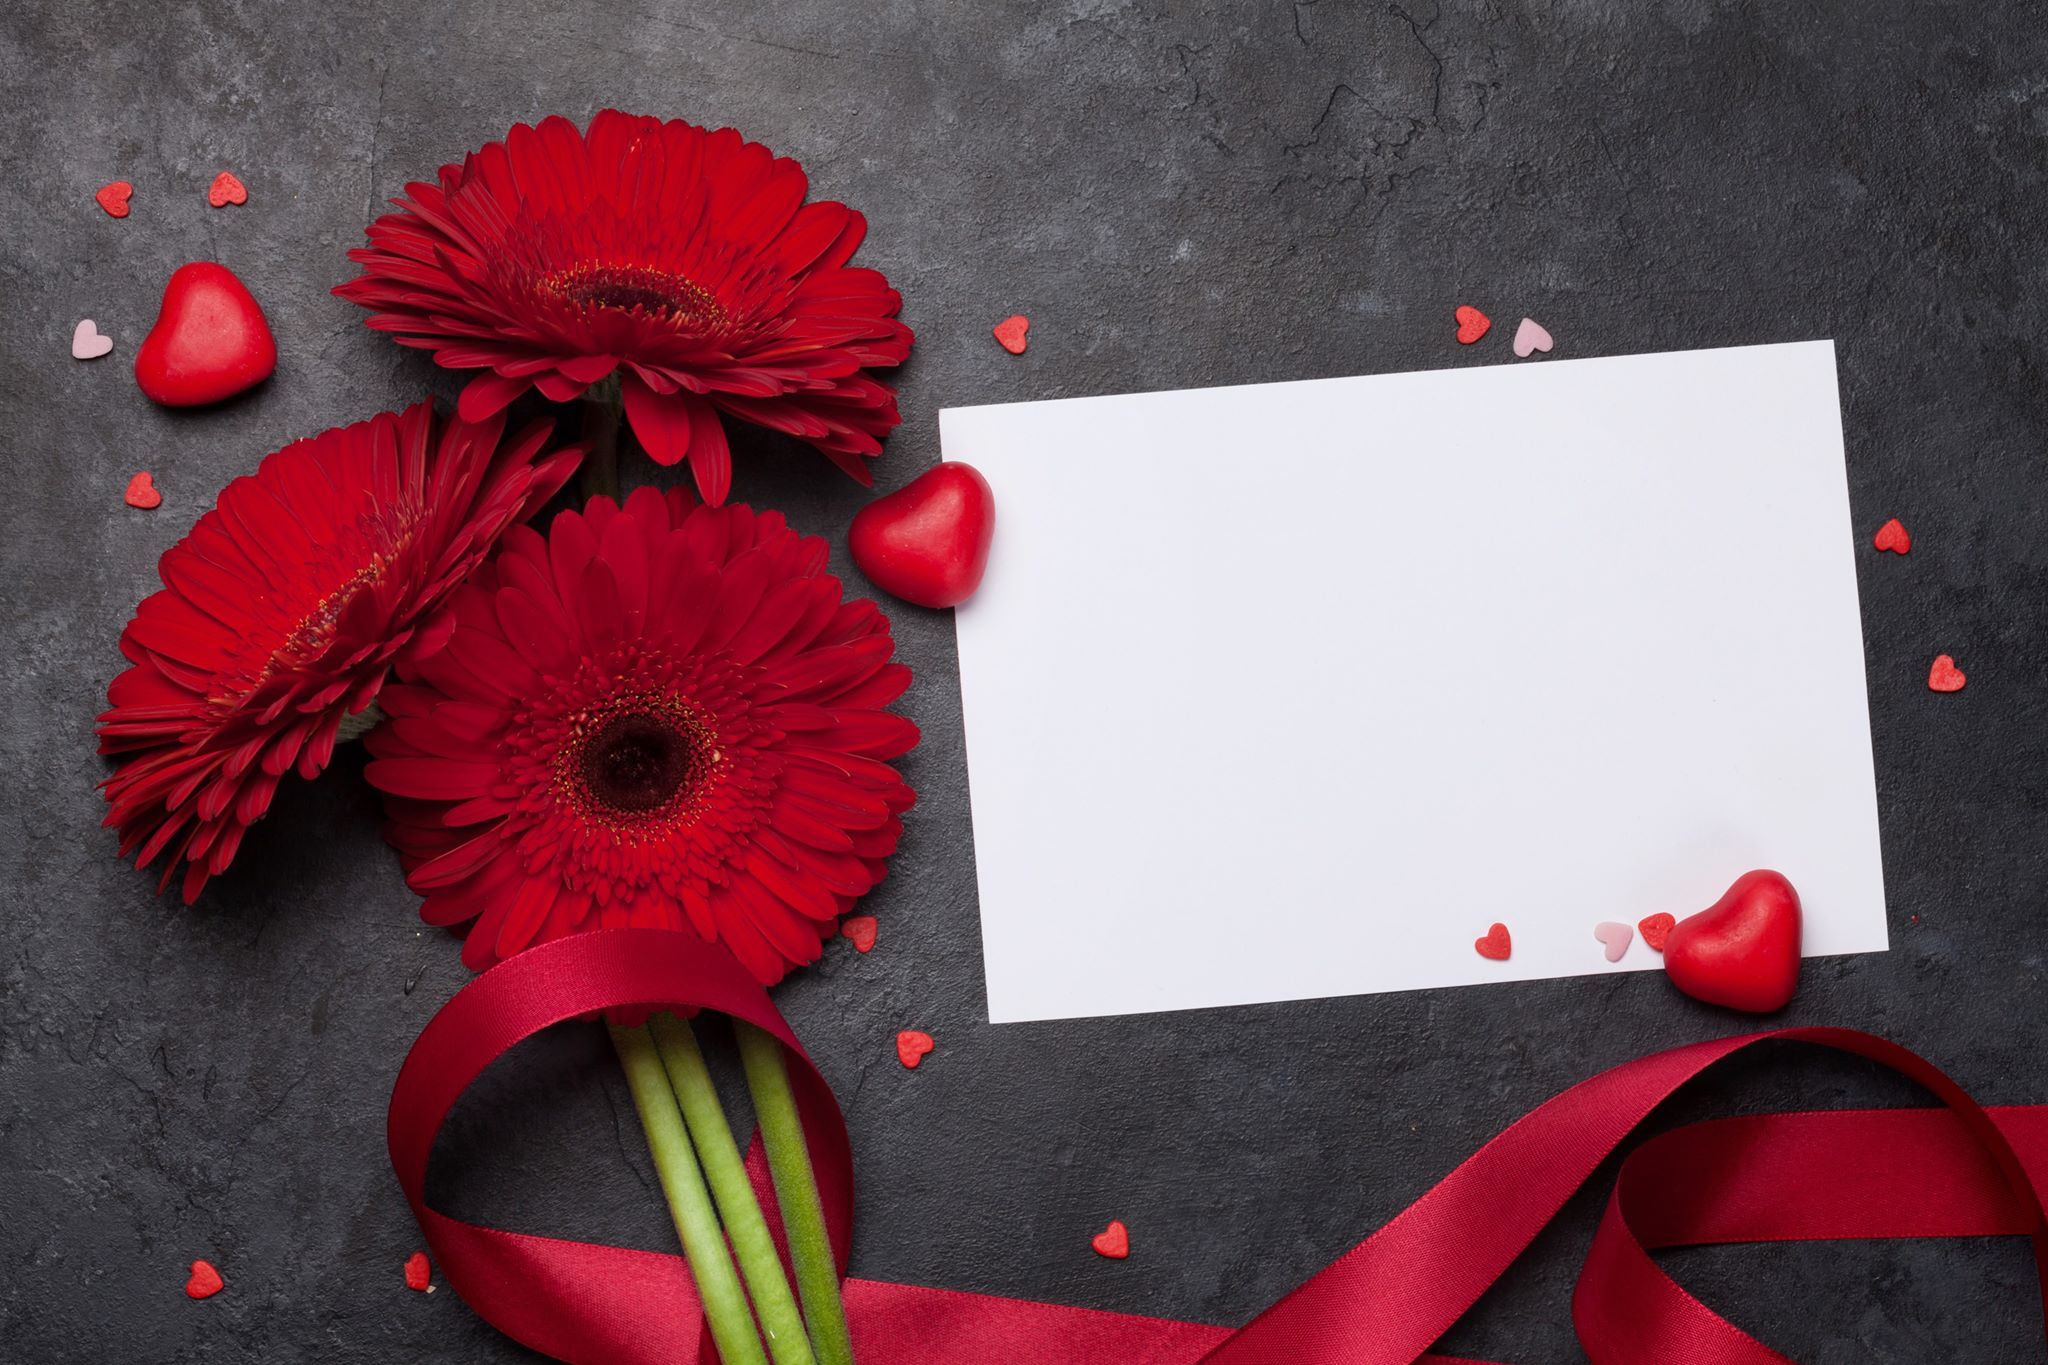 Valentines day images 14 صور عيد الحب